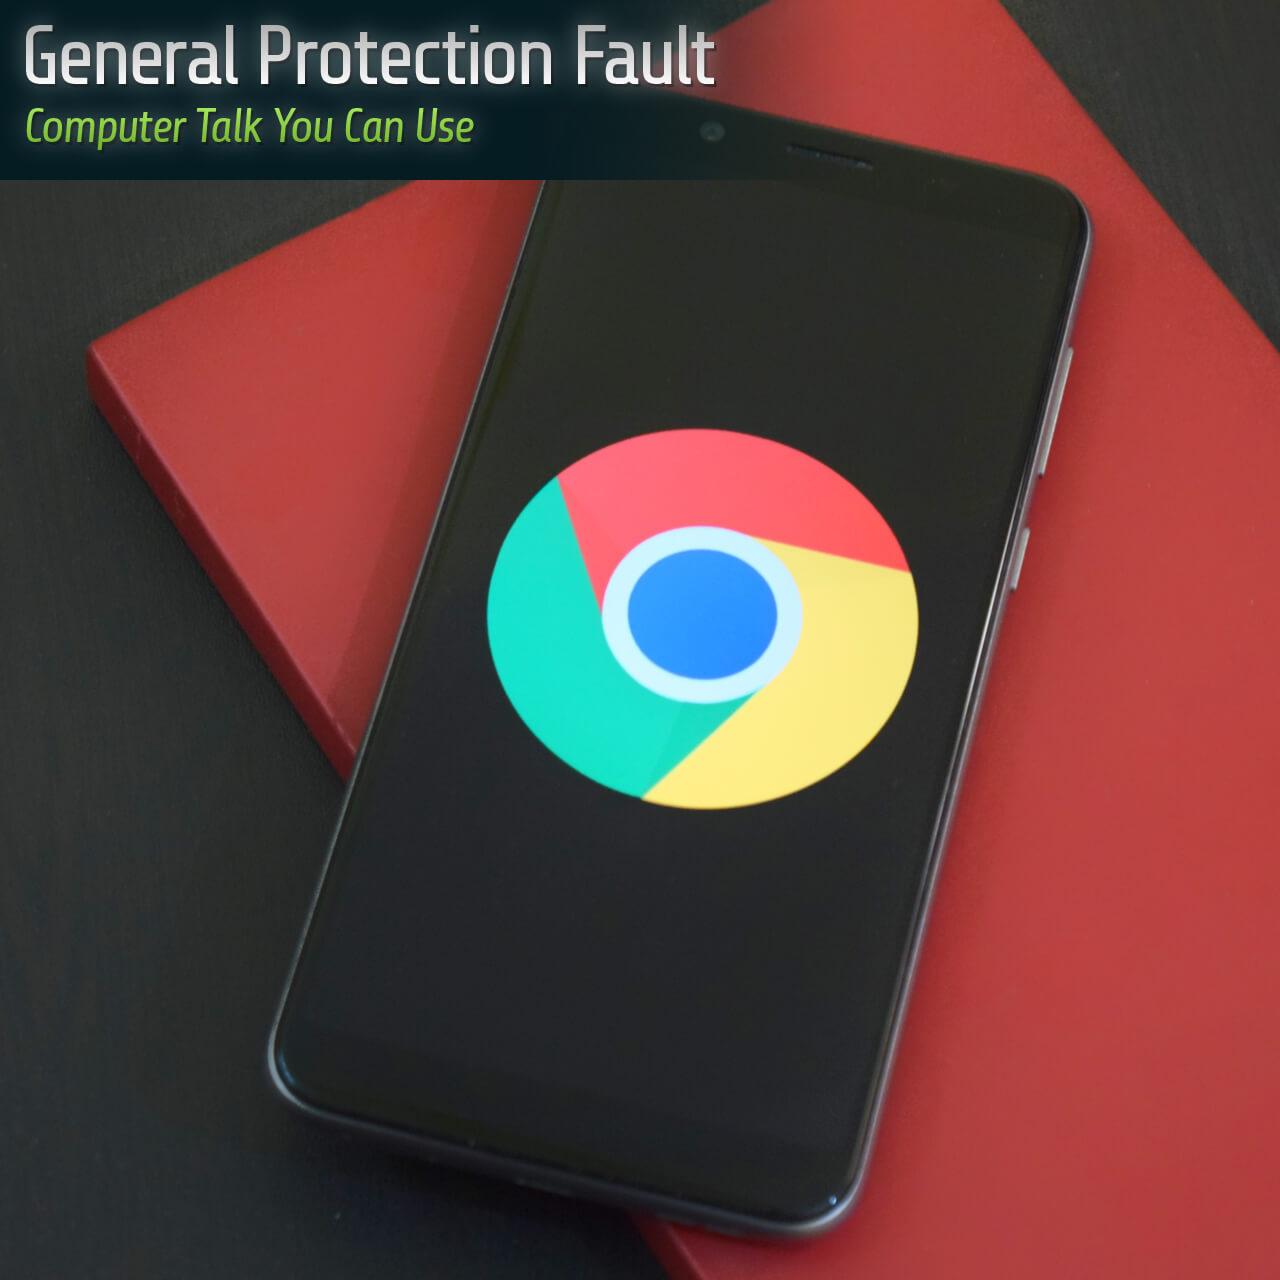 Antitrust? let me Google that, October 28th 2020